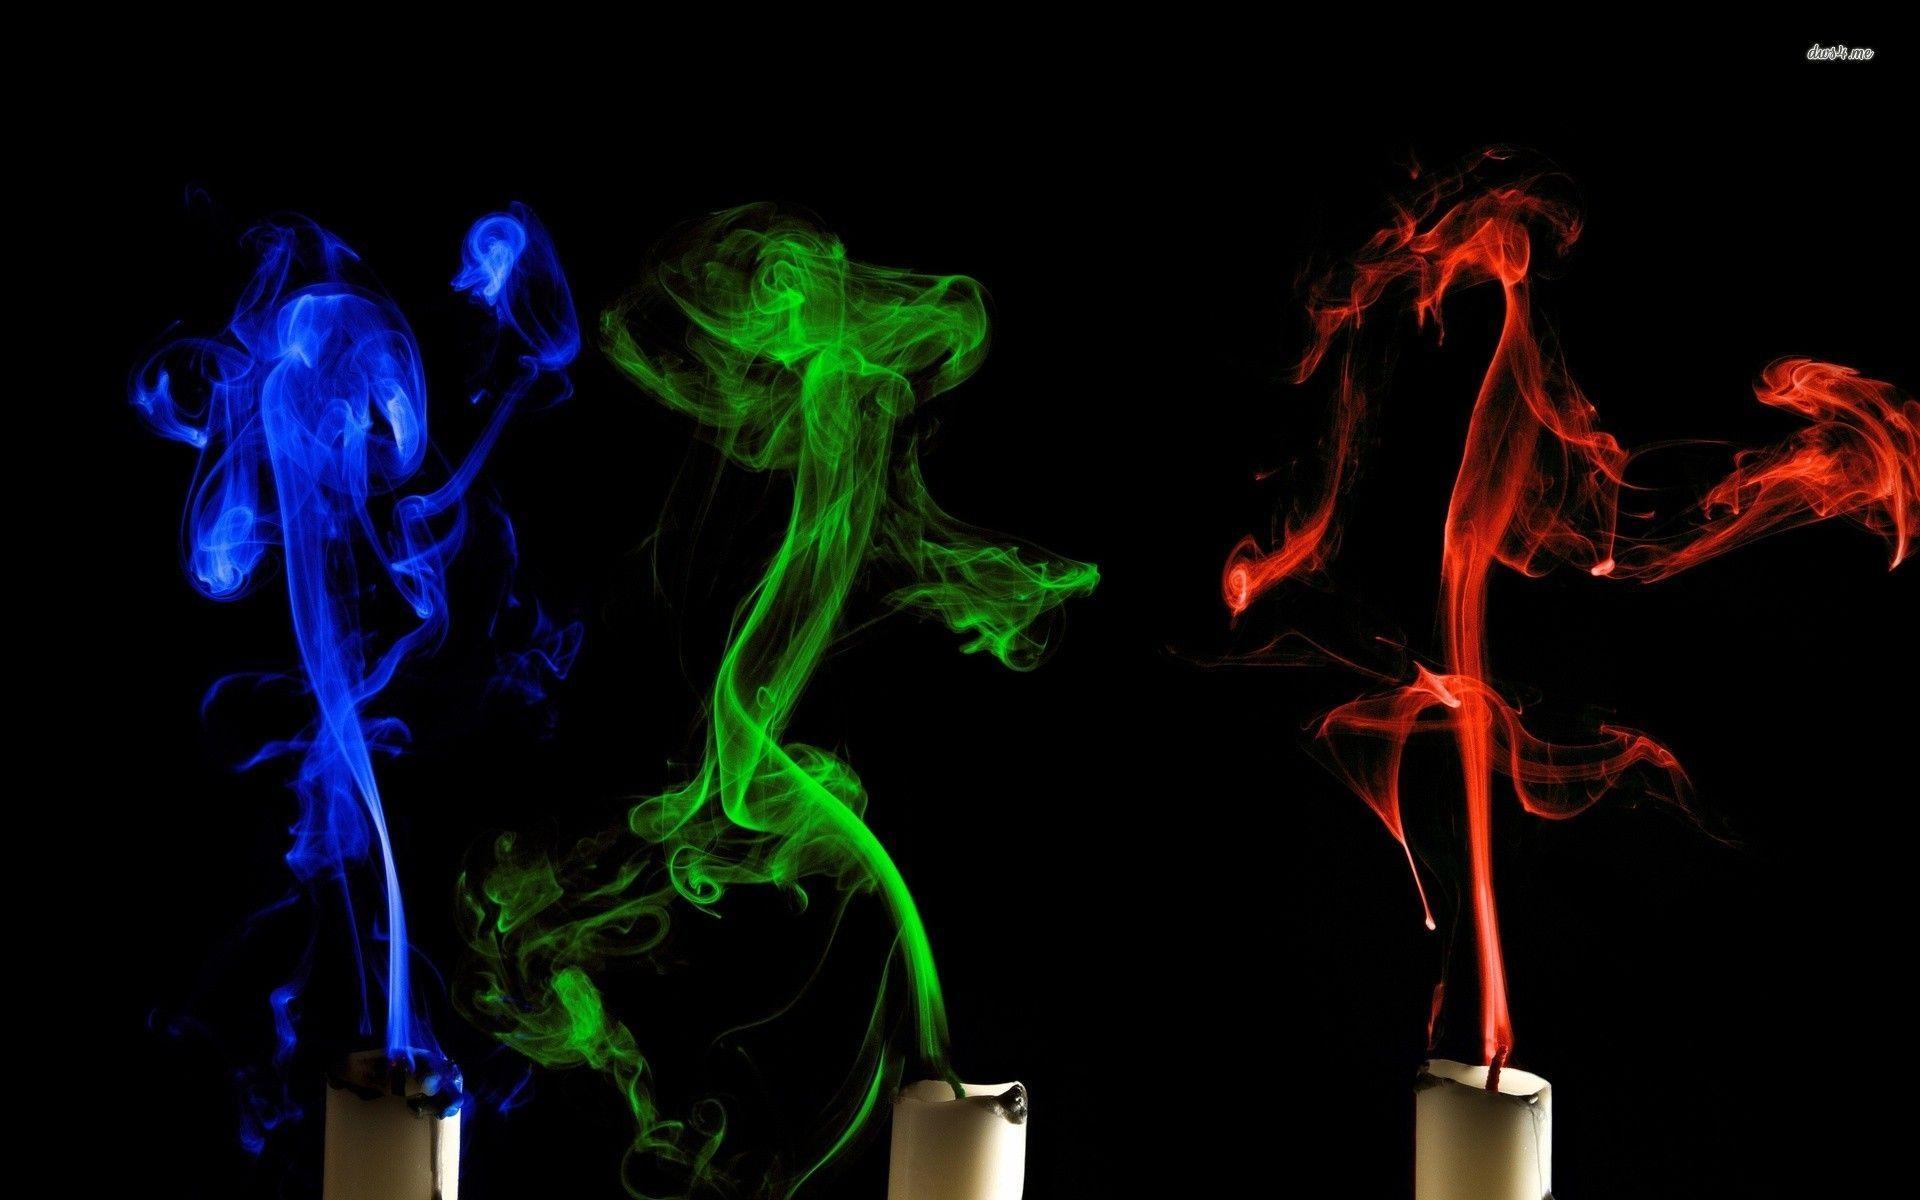 colorful smoke wallpaper designs - photo #27